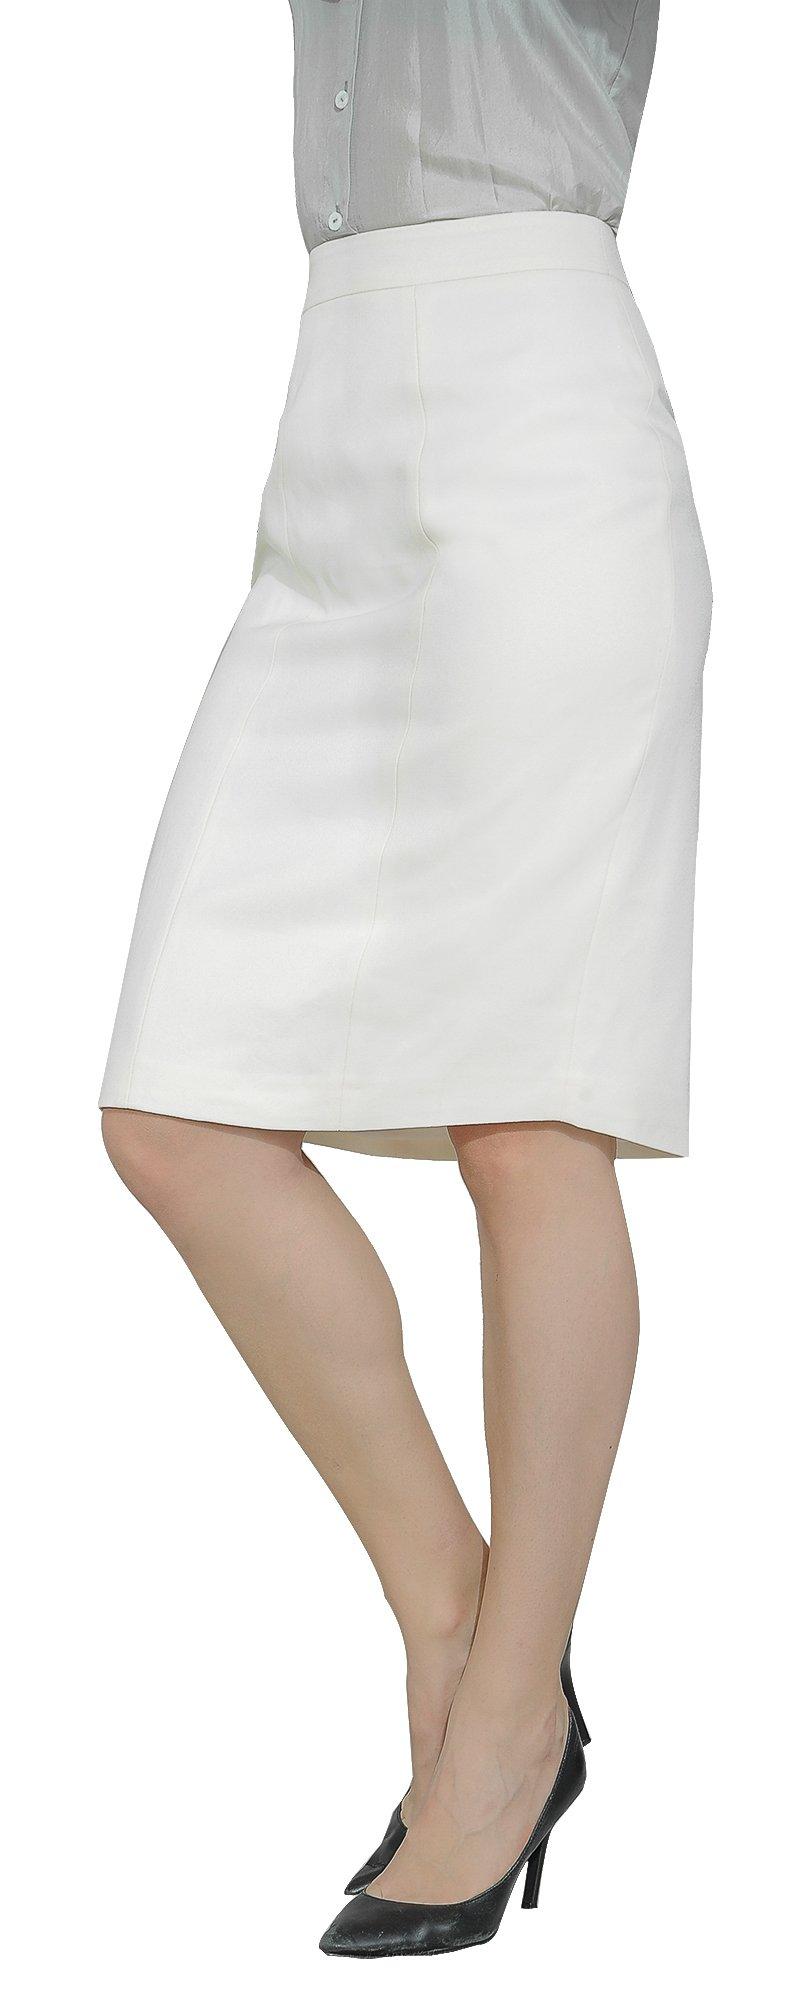 Marycrafts Women's Lined Pencil Skirt 4 Work Business Office 10 Beige